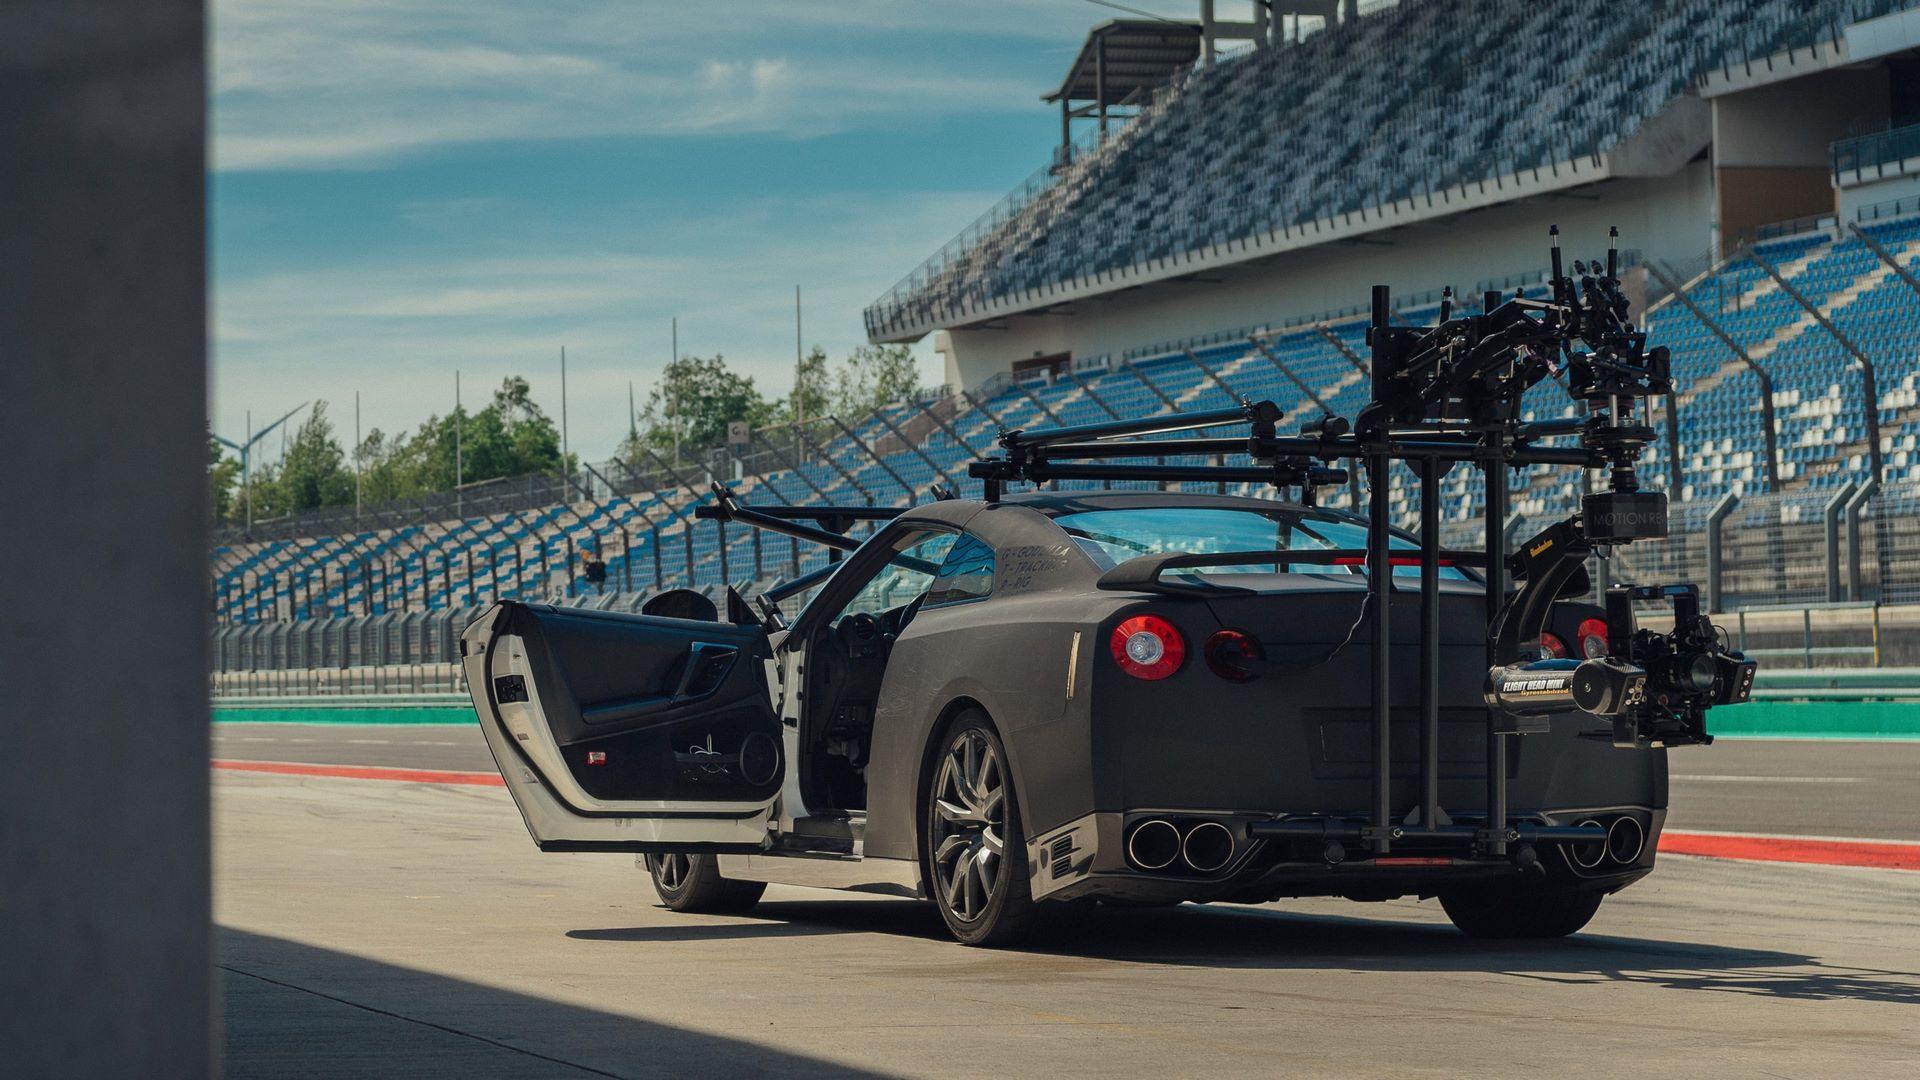 Nissan-GT-R-Camera-Car-11